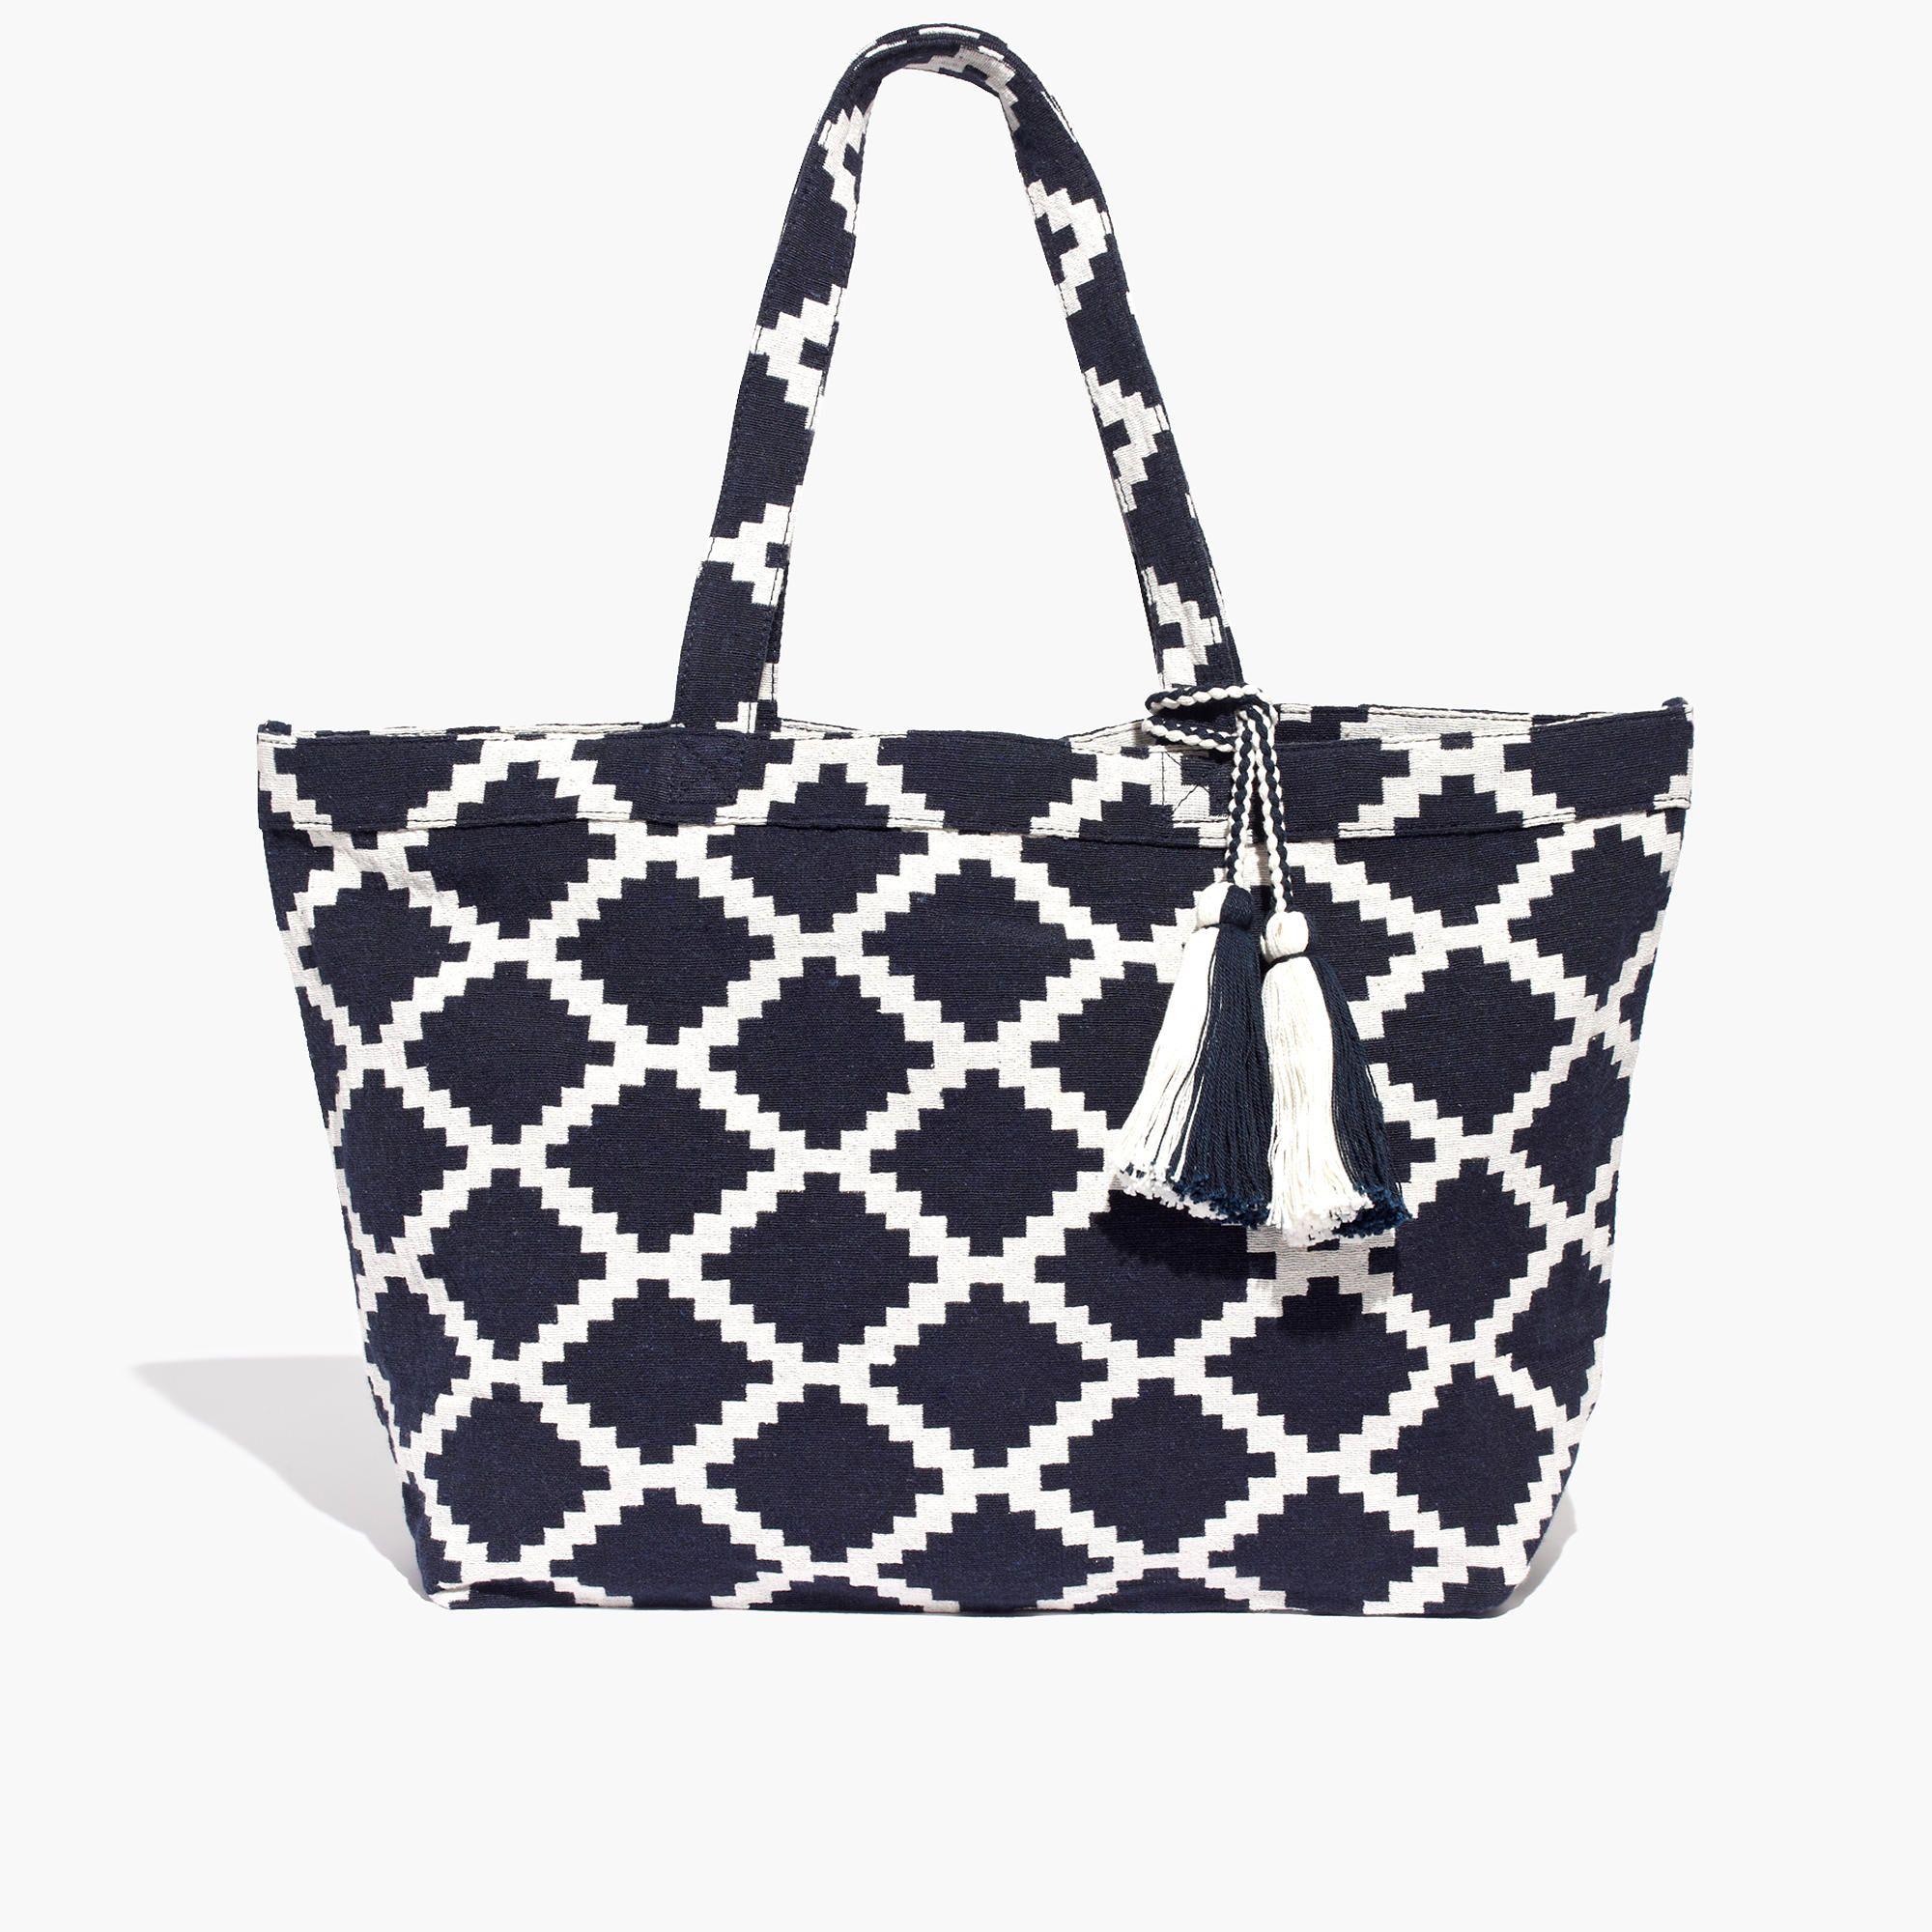 1eff902c4c Madewell The Amalfi Jacquard Tote Bag